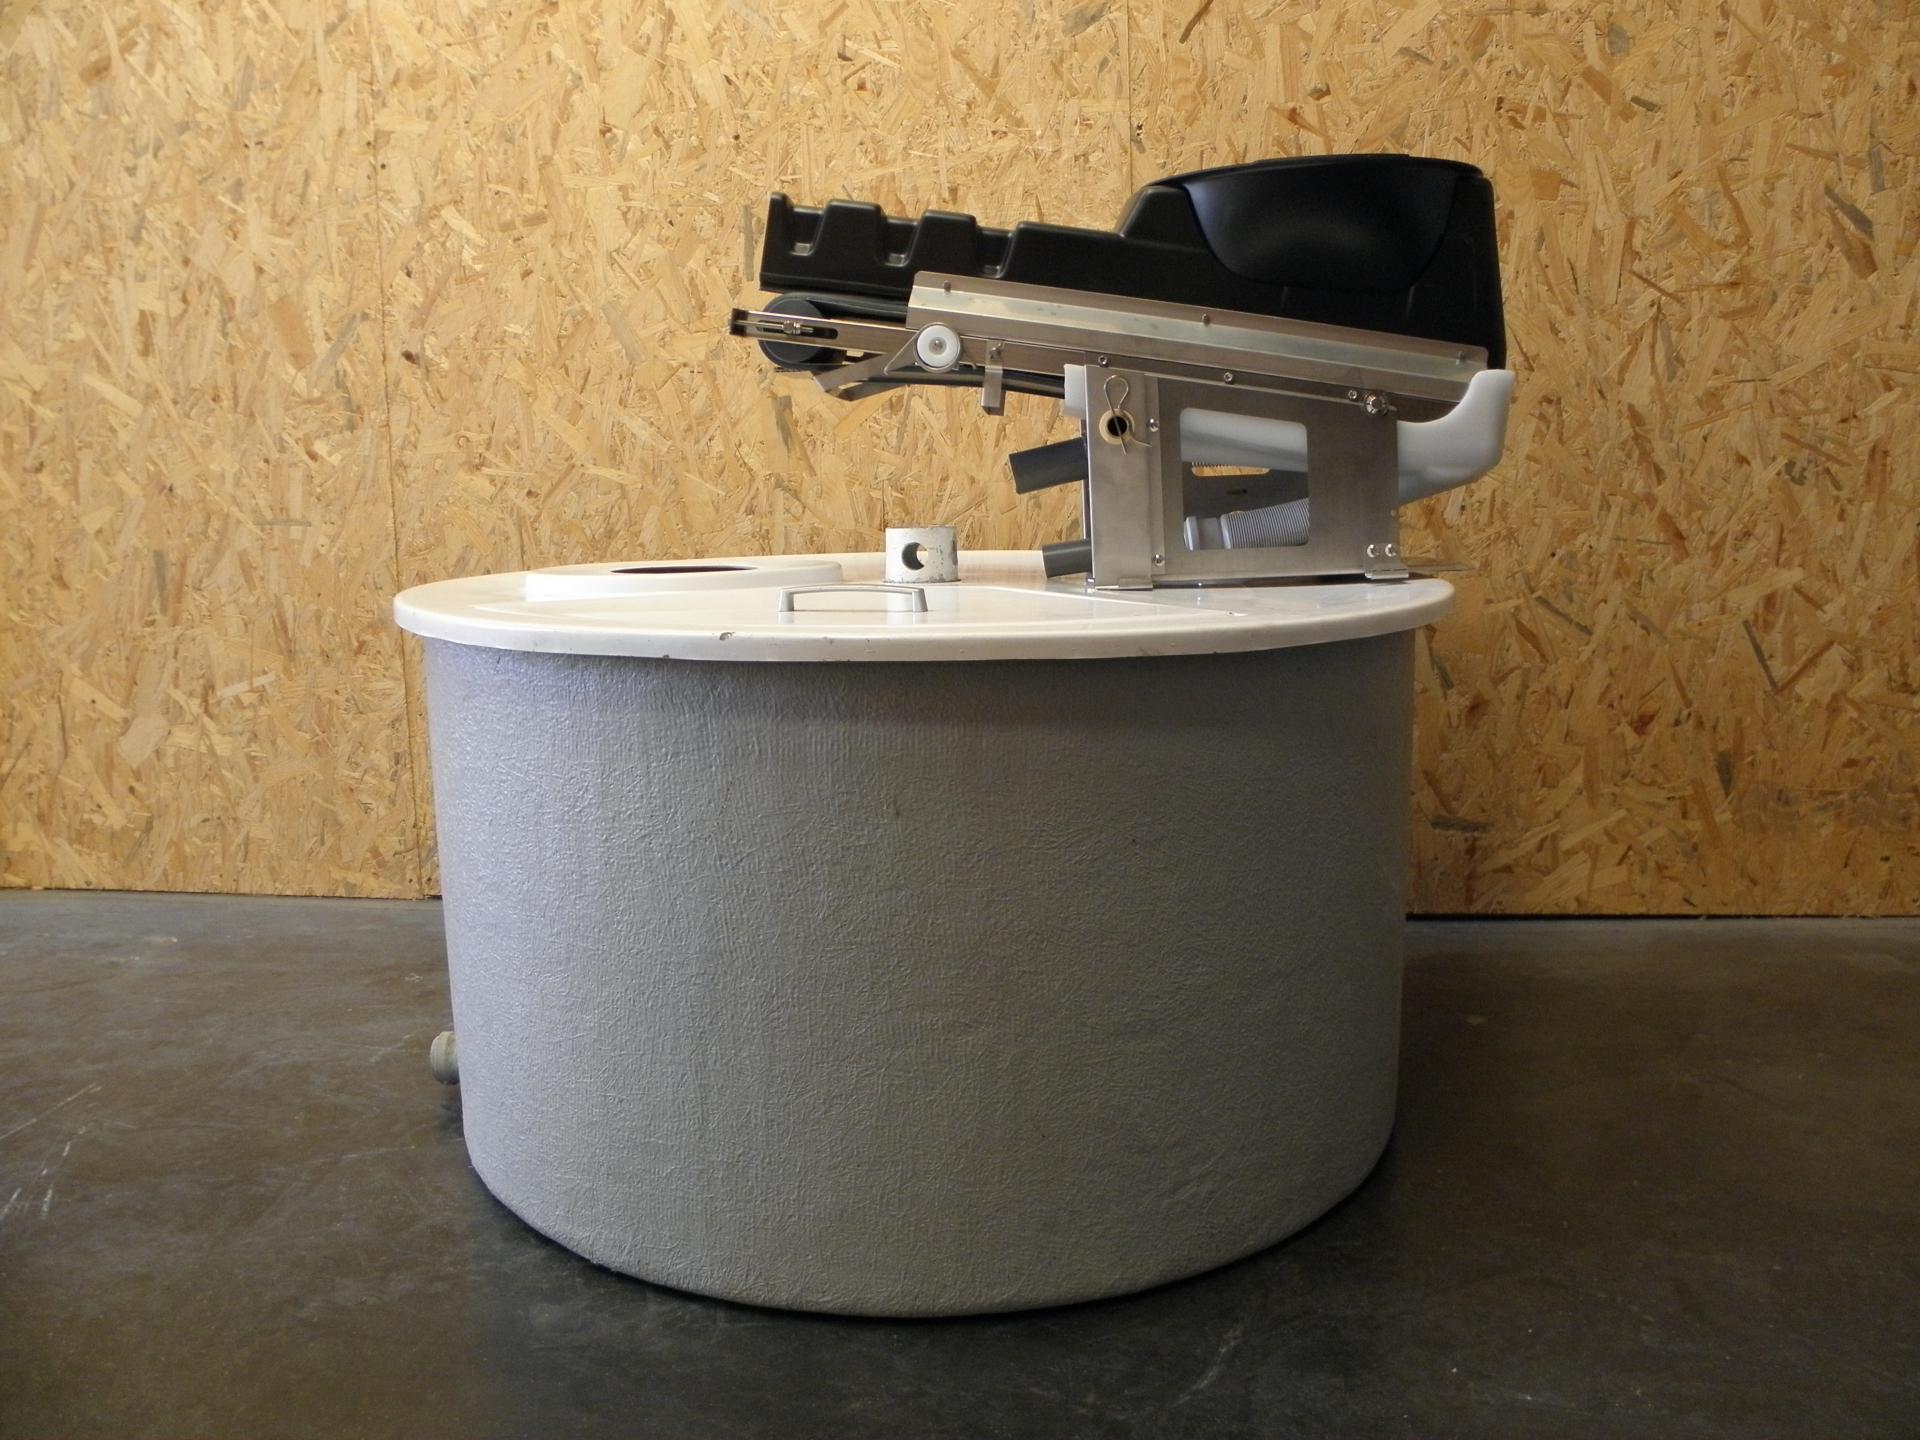 Toilette sèche Ecodomeo zircone et composteur